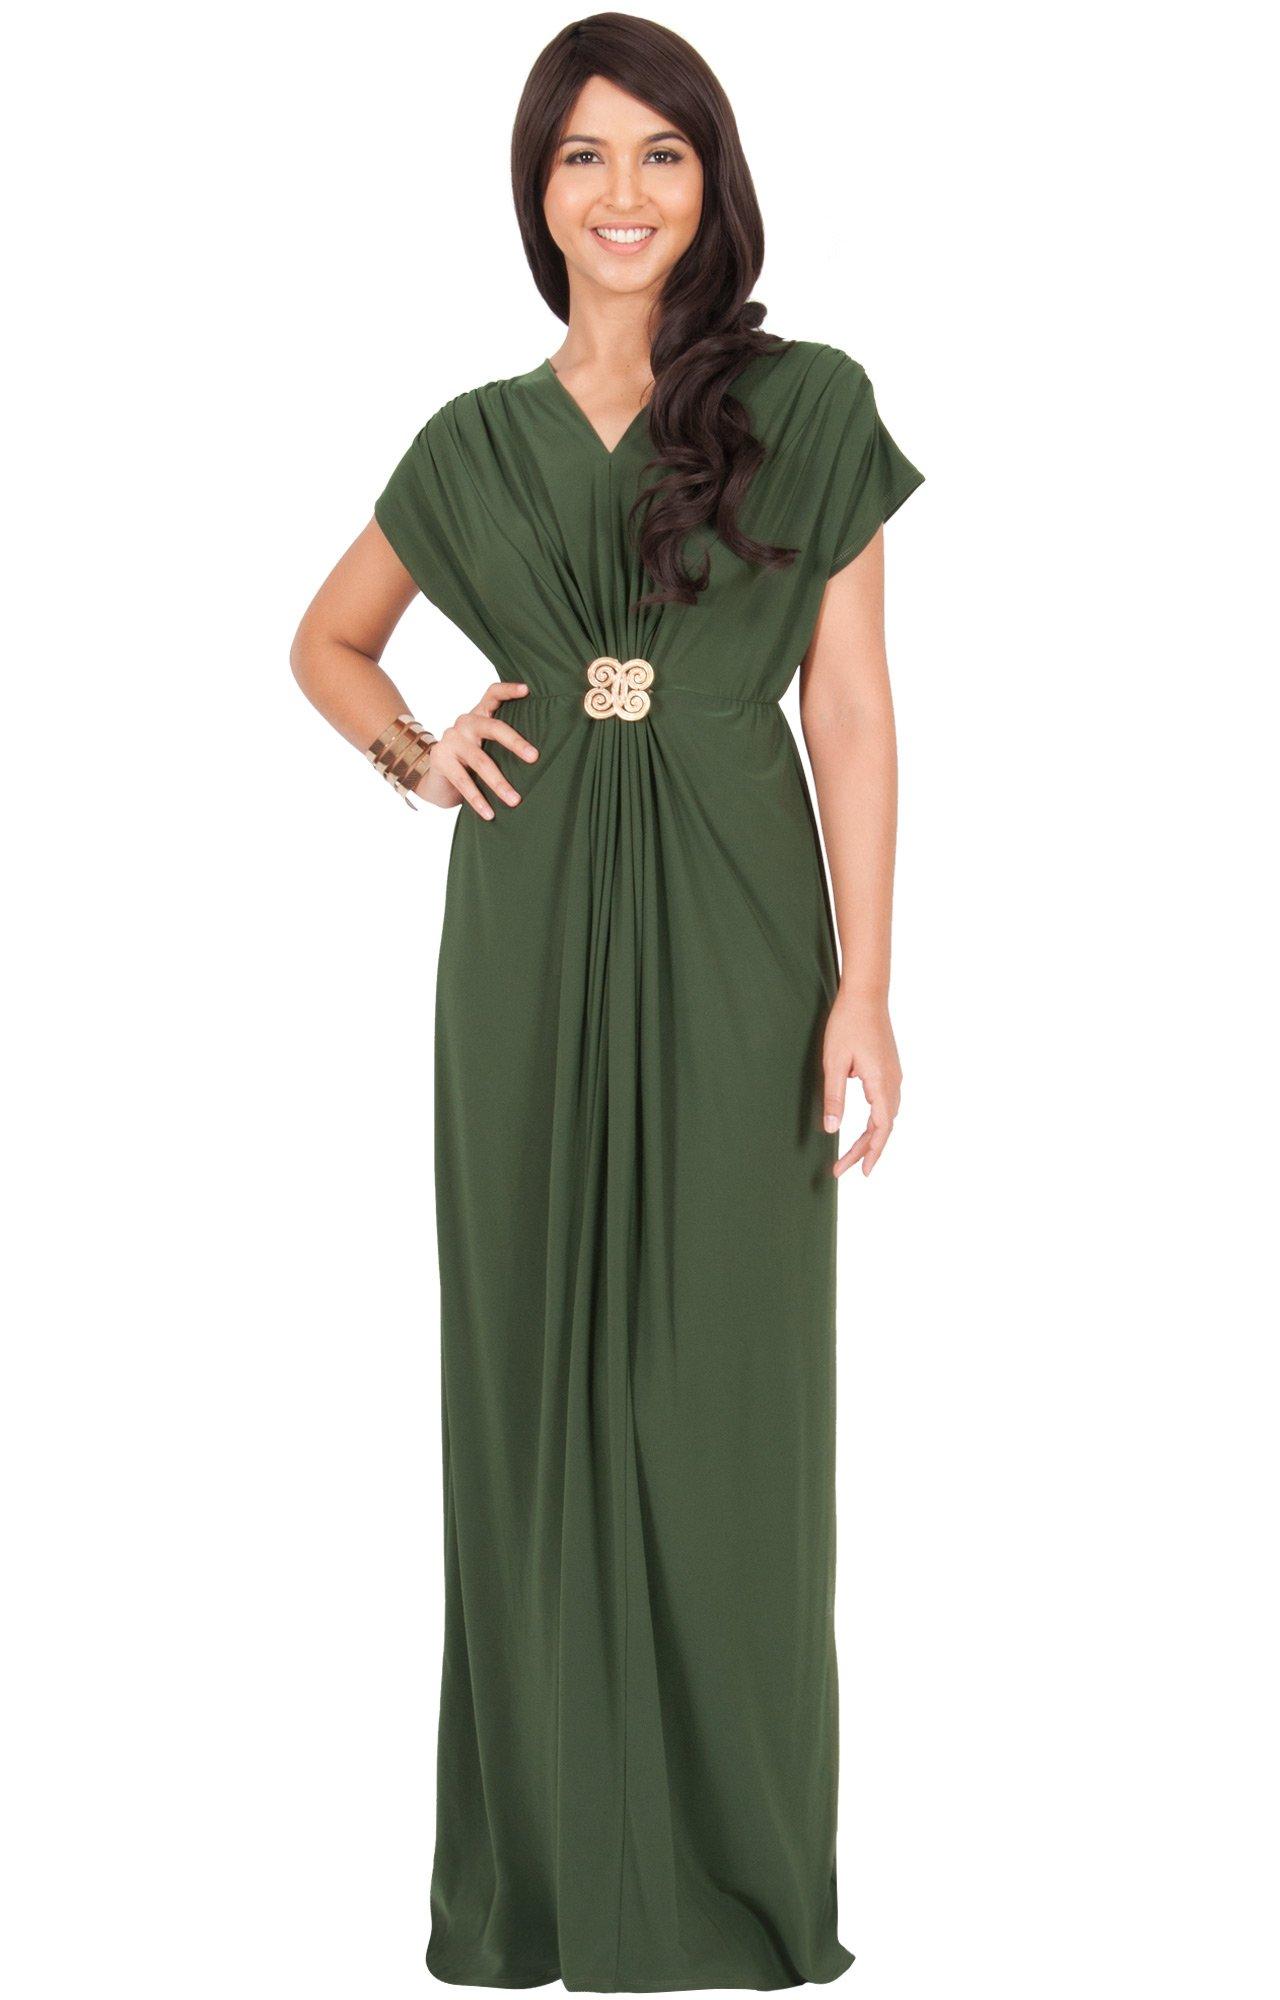 Olive Green Dresses for Weddings: Amazon.com